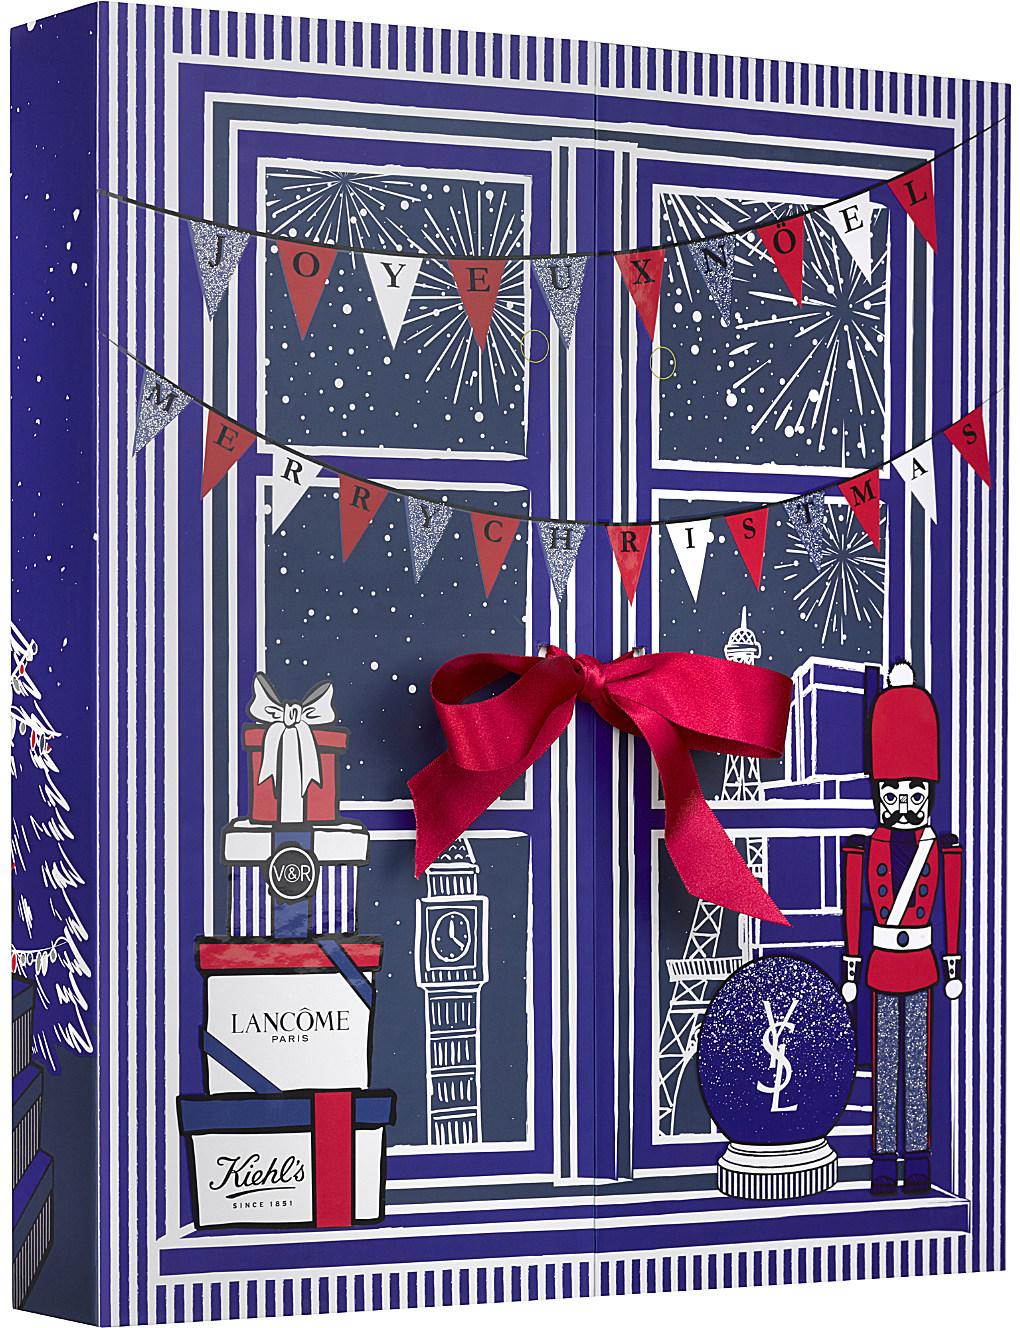 selfridges beauty advent calendar 2017